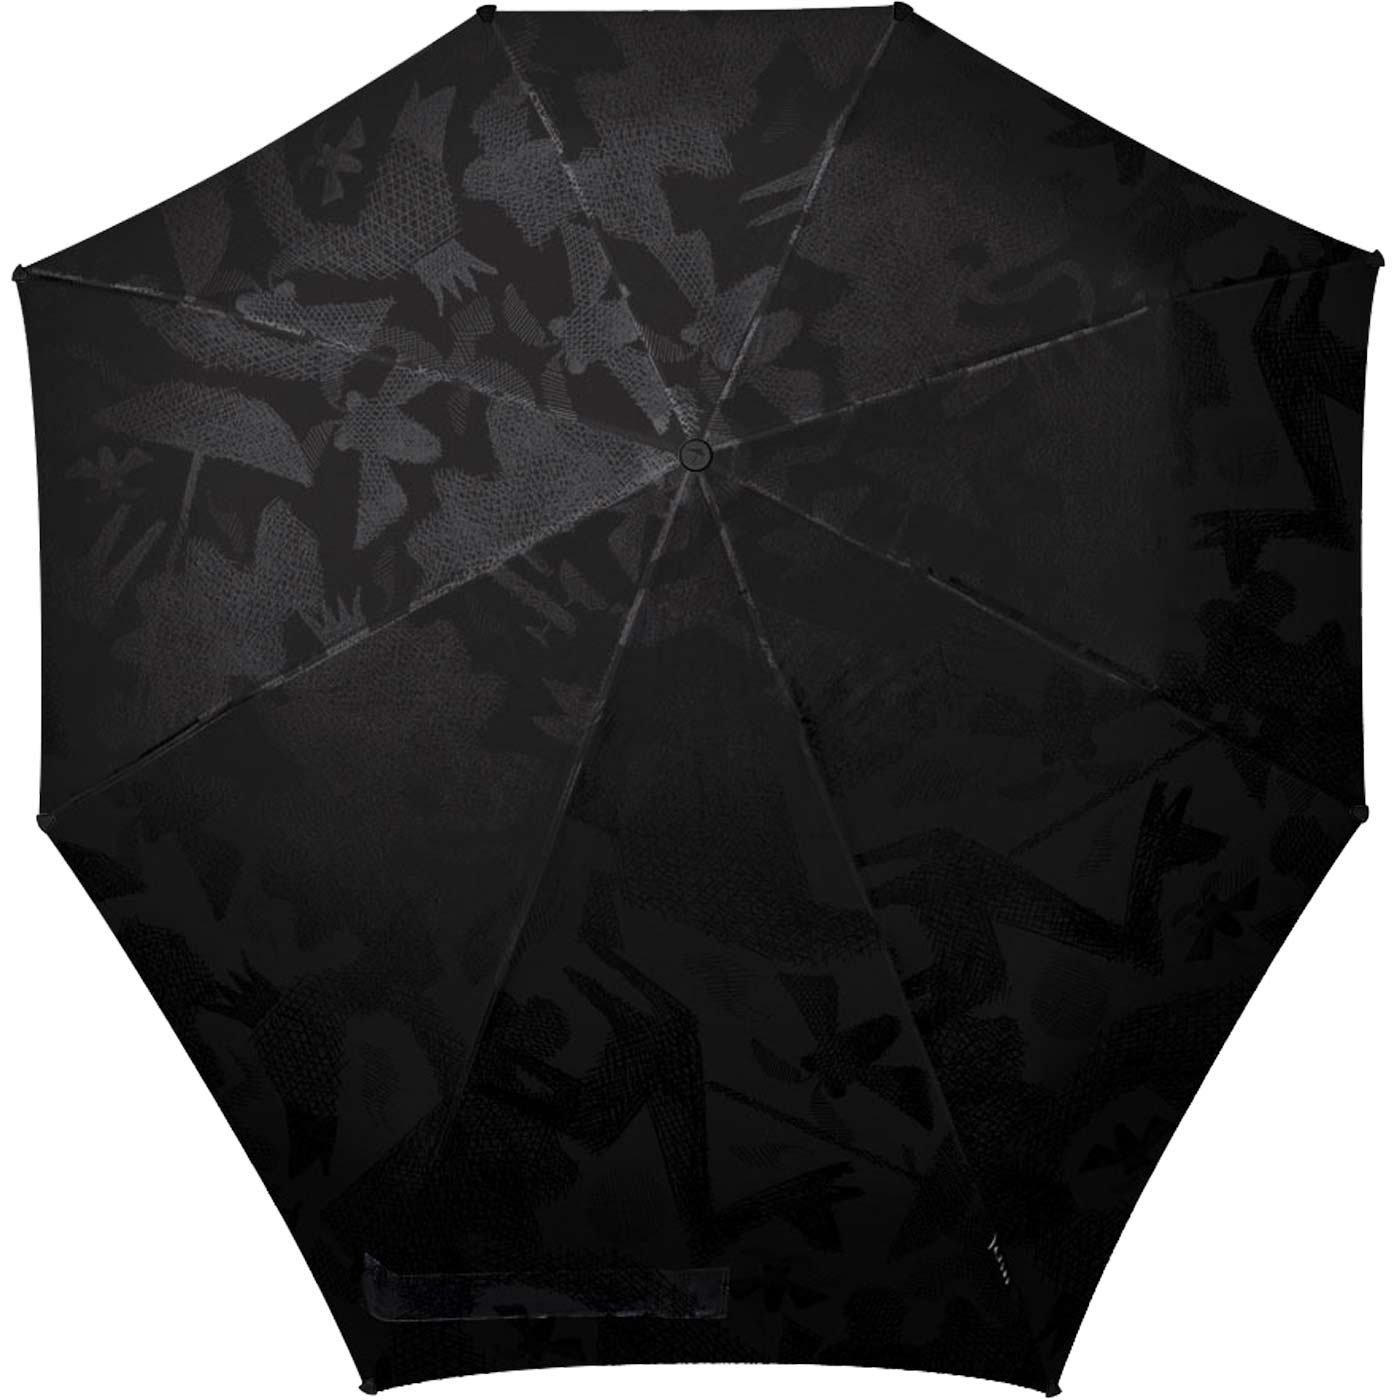 senz - Sturmschirm senz automatic - Plegable negro negro 91-92 cm: Amazon.es: Equipaje